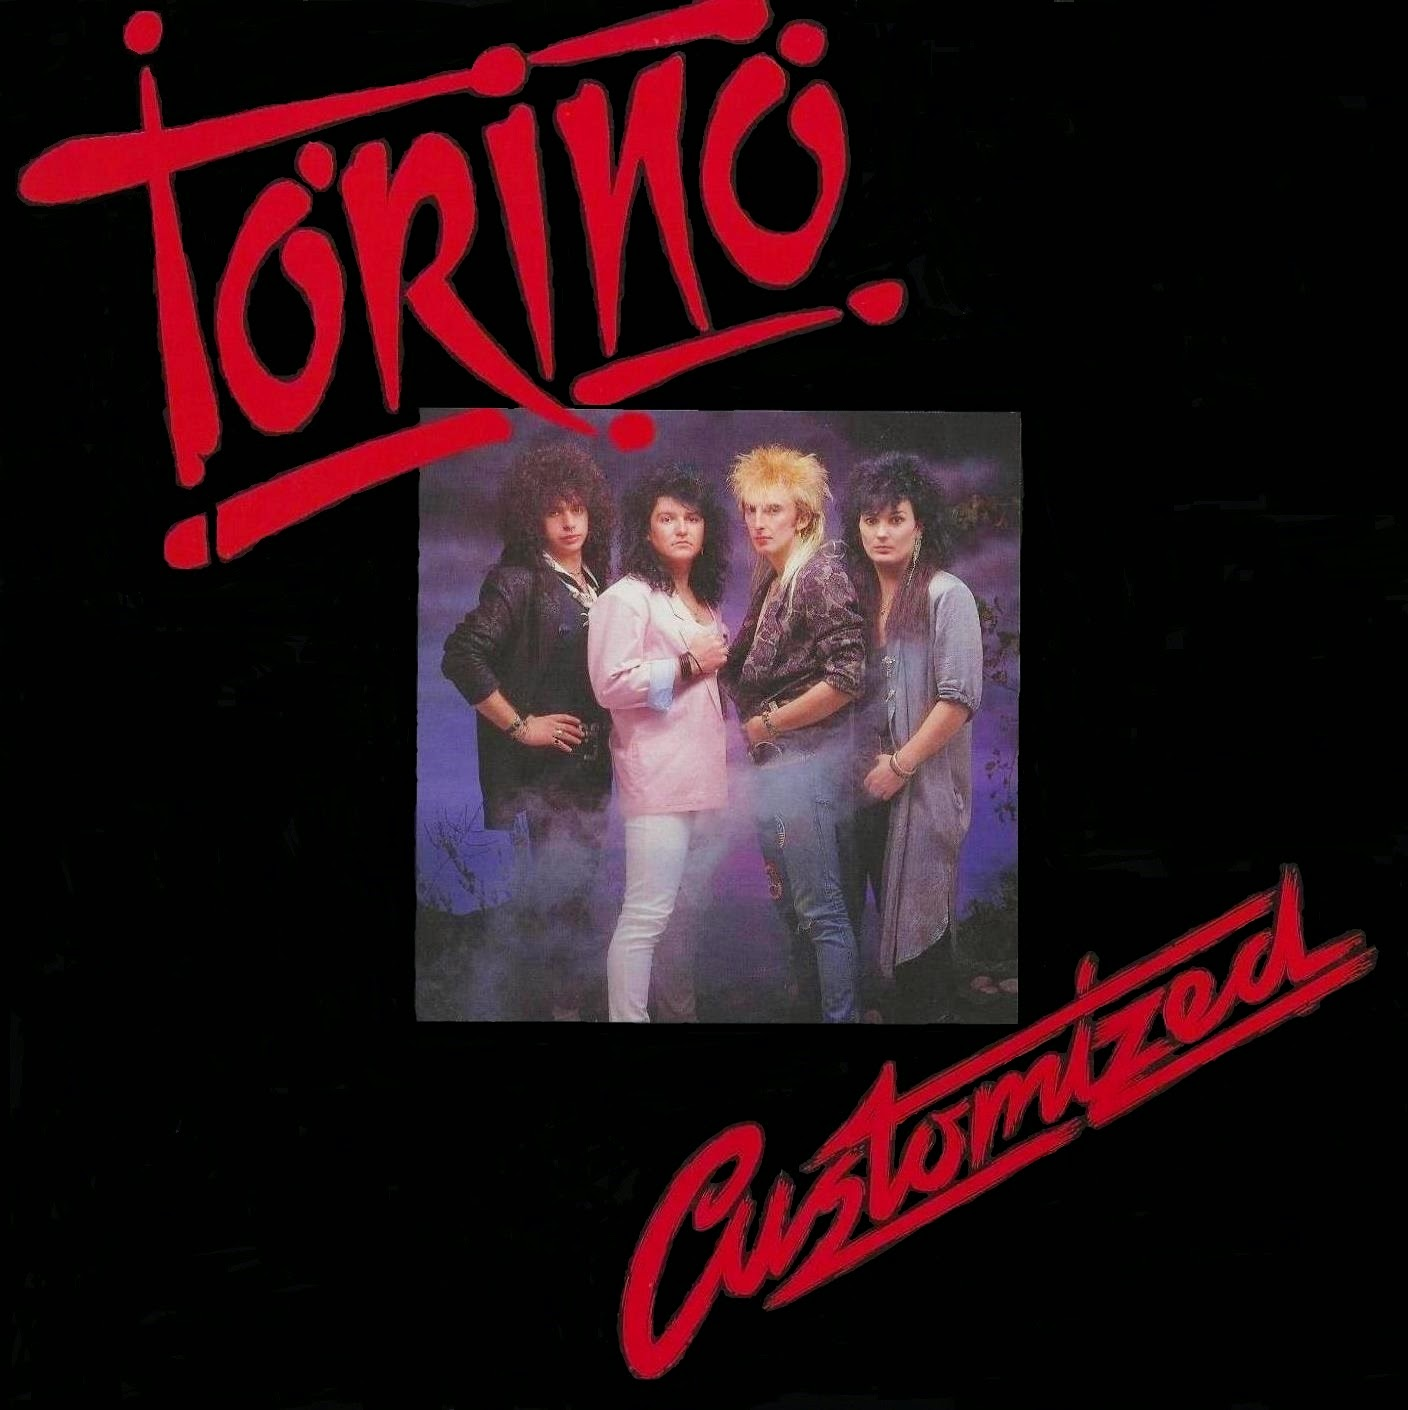 Torino Customized 1988 aor melodic rock